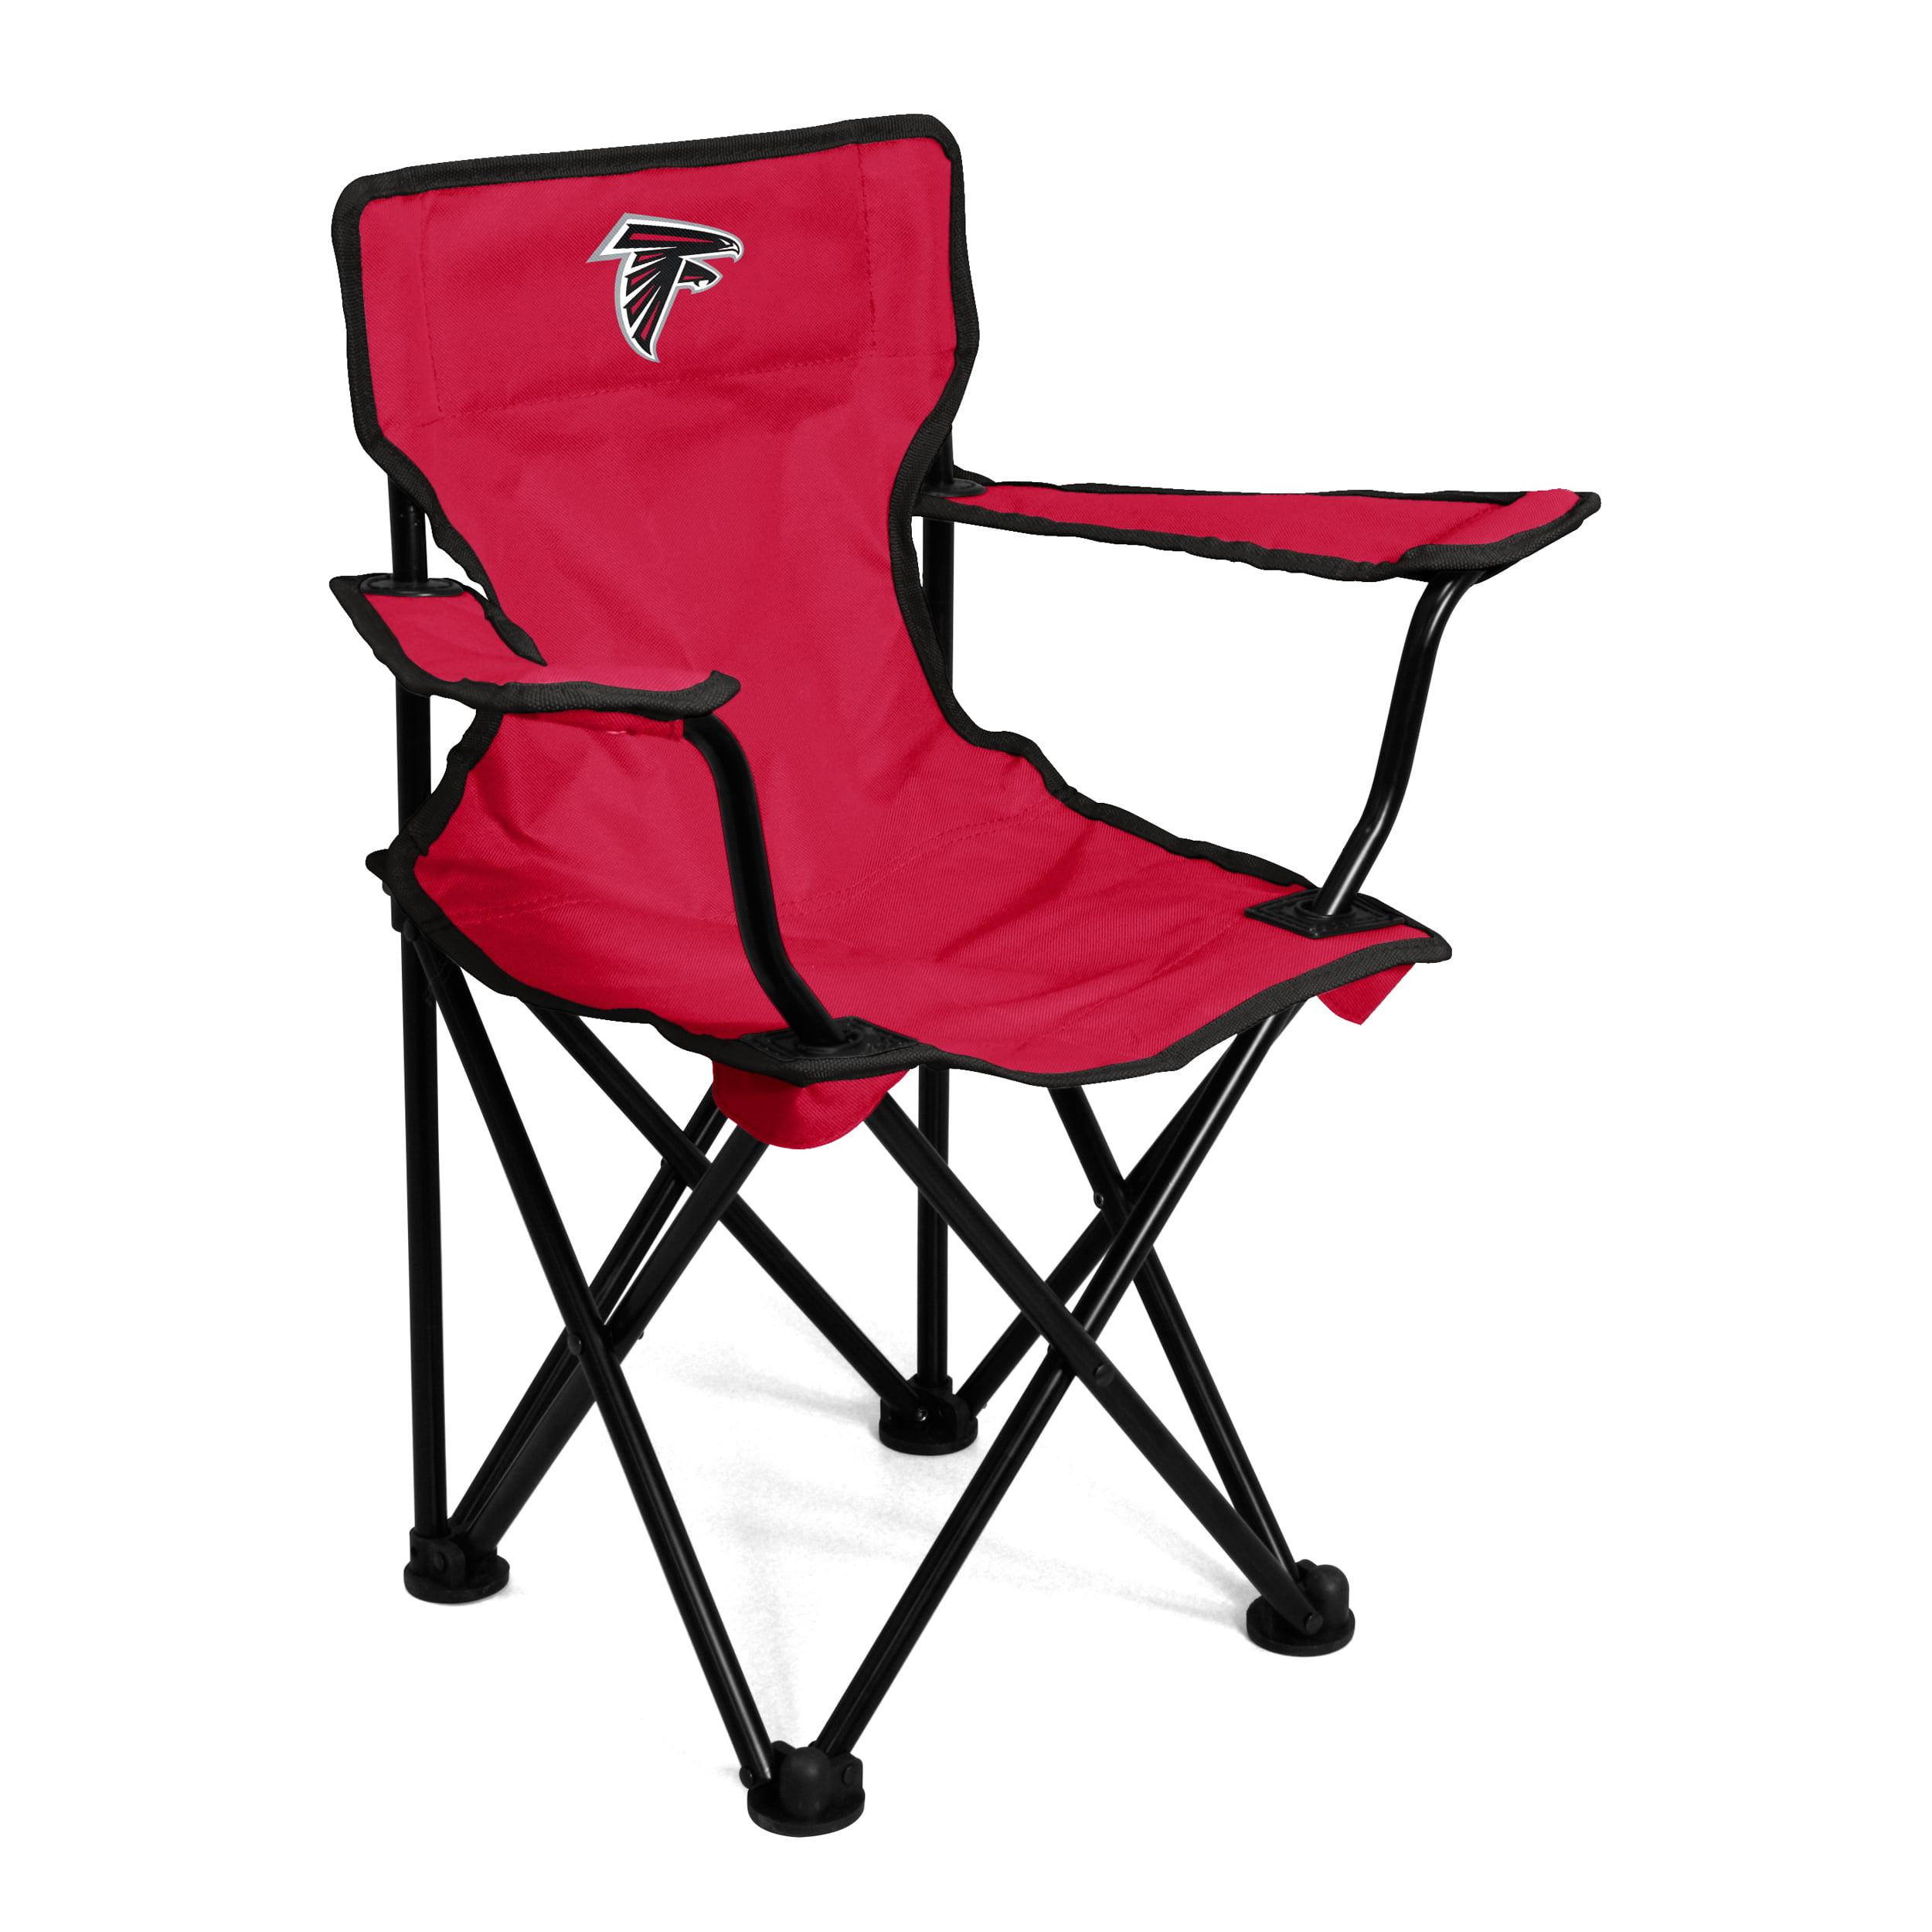 Atlanta Falcons Toddler Tailgate Chair - No Size